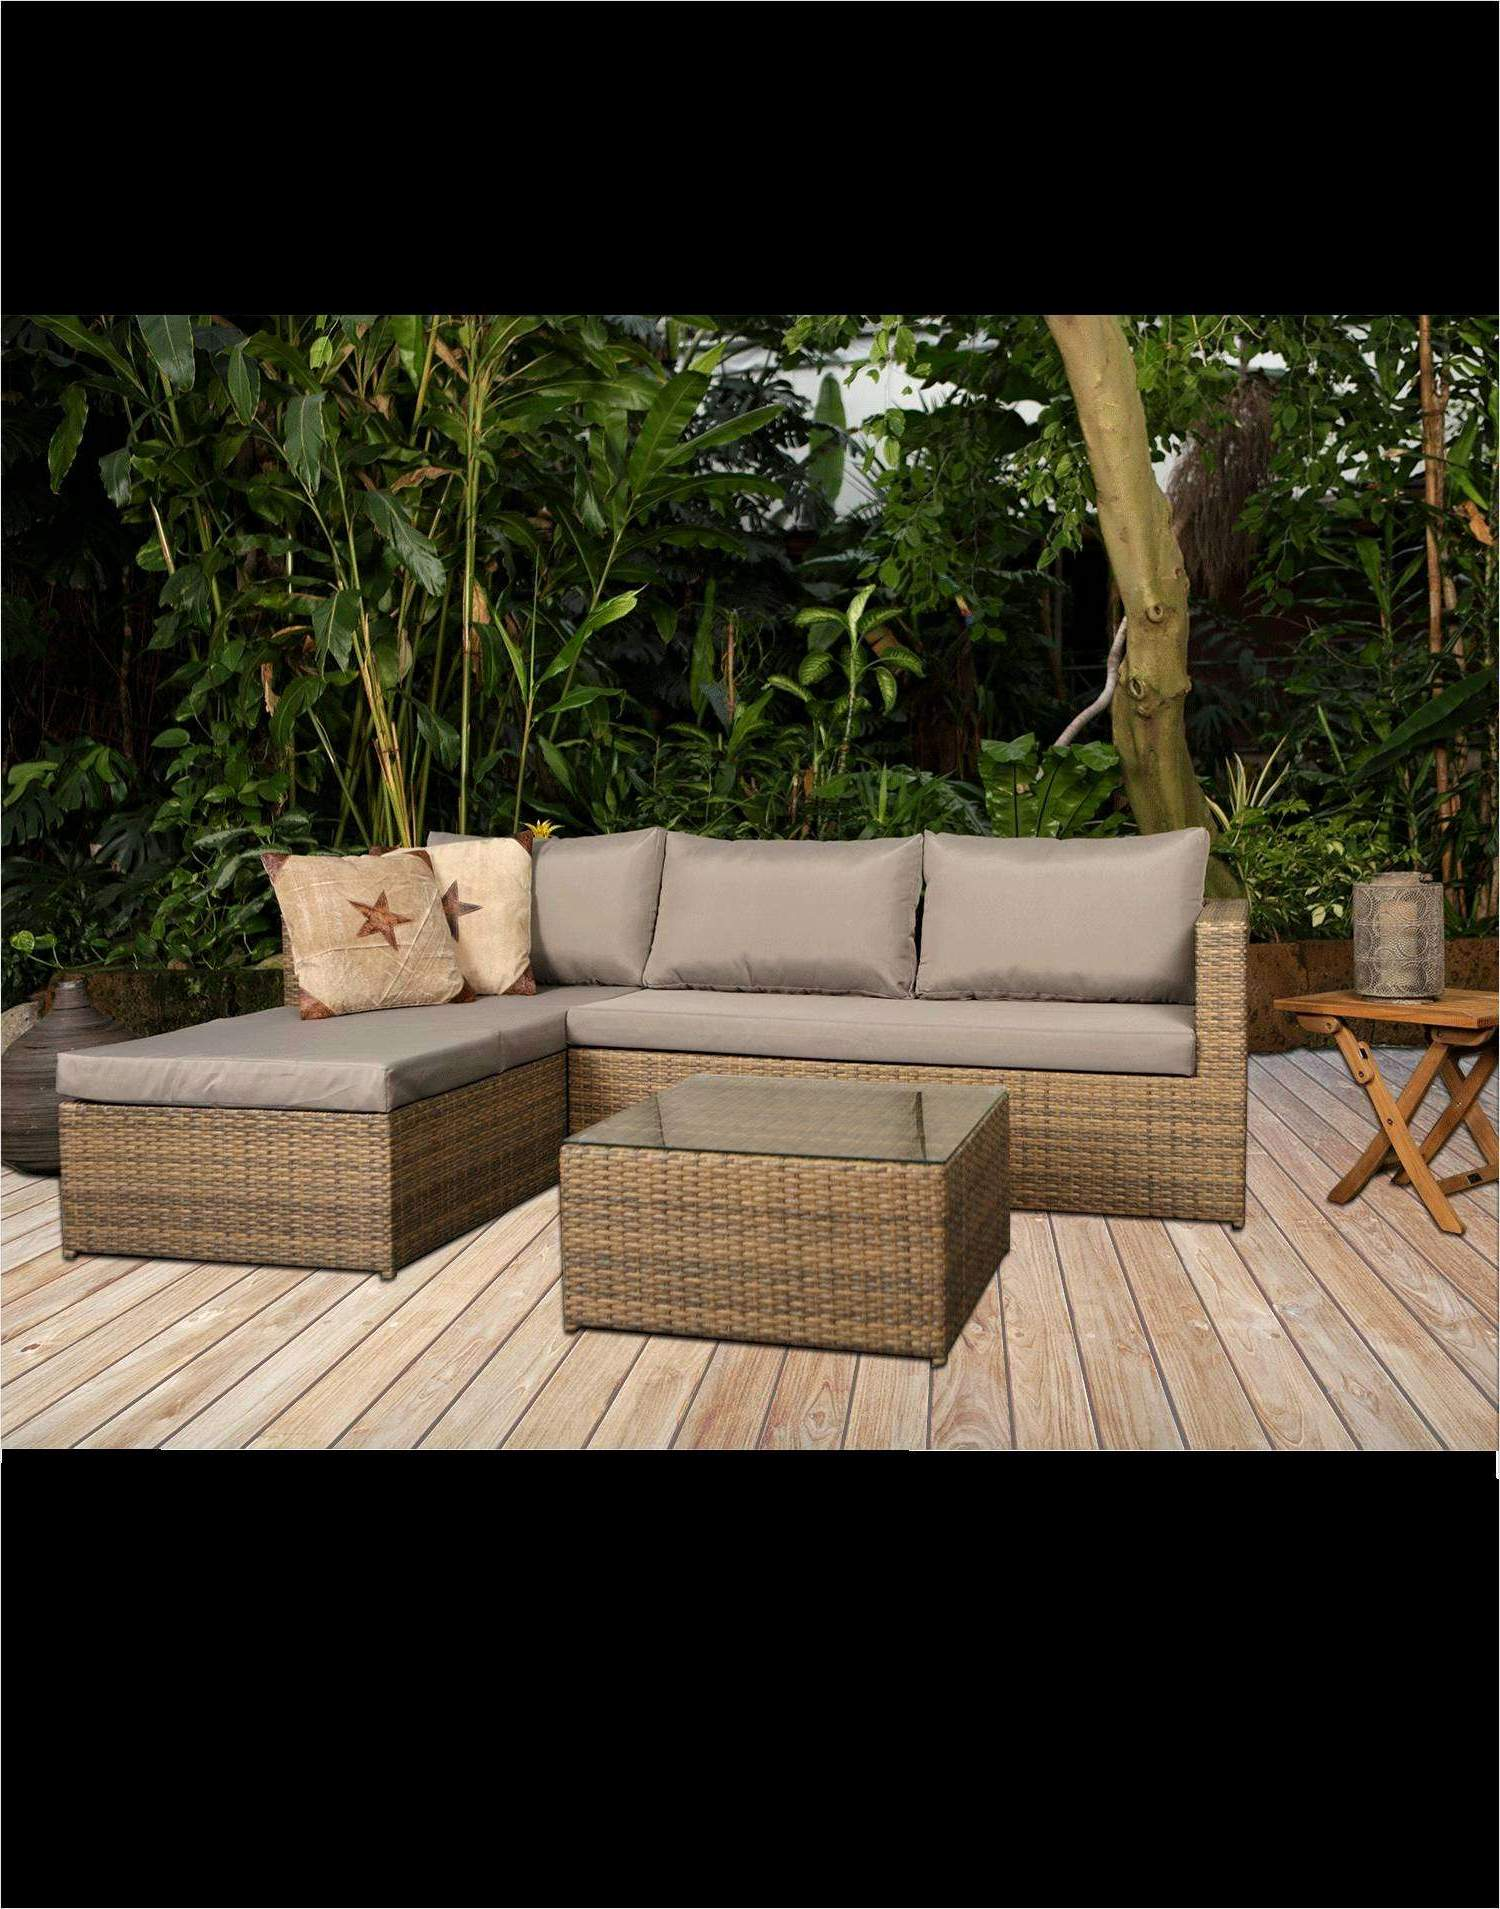 gartenstuhl gunstig luxus moderne garten lounge awesome csbkcmom of lounge sessel terrasse